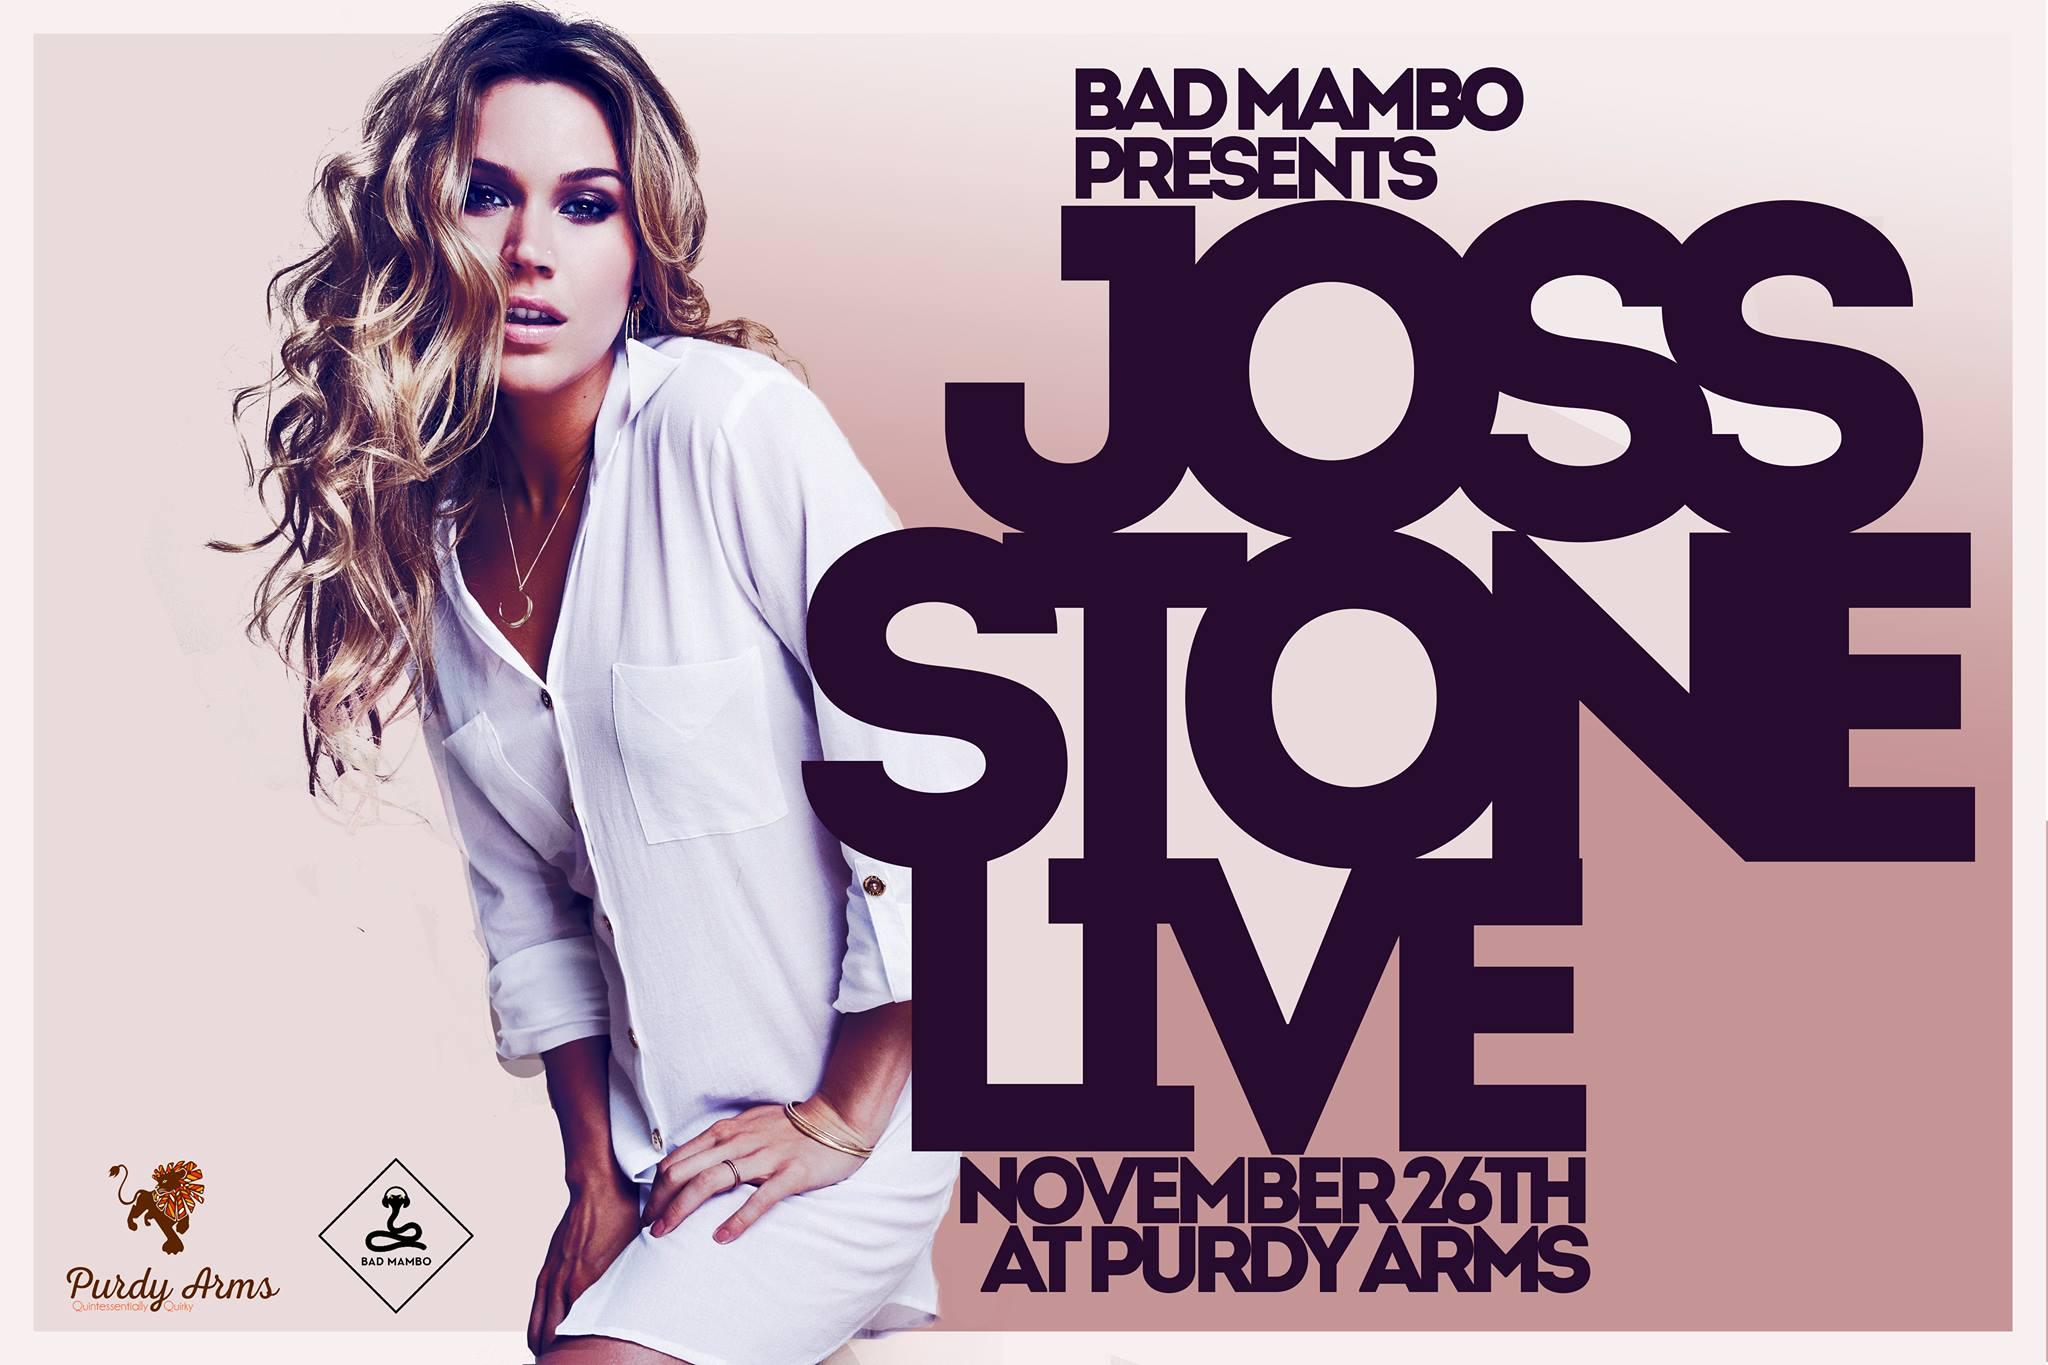 joss-stone-image-facebook